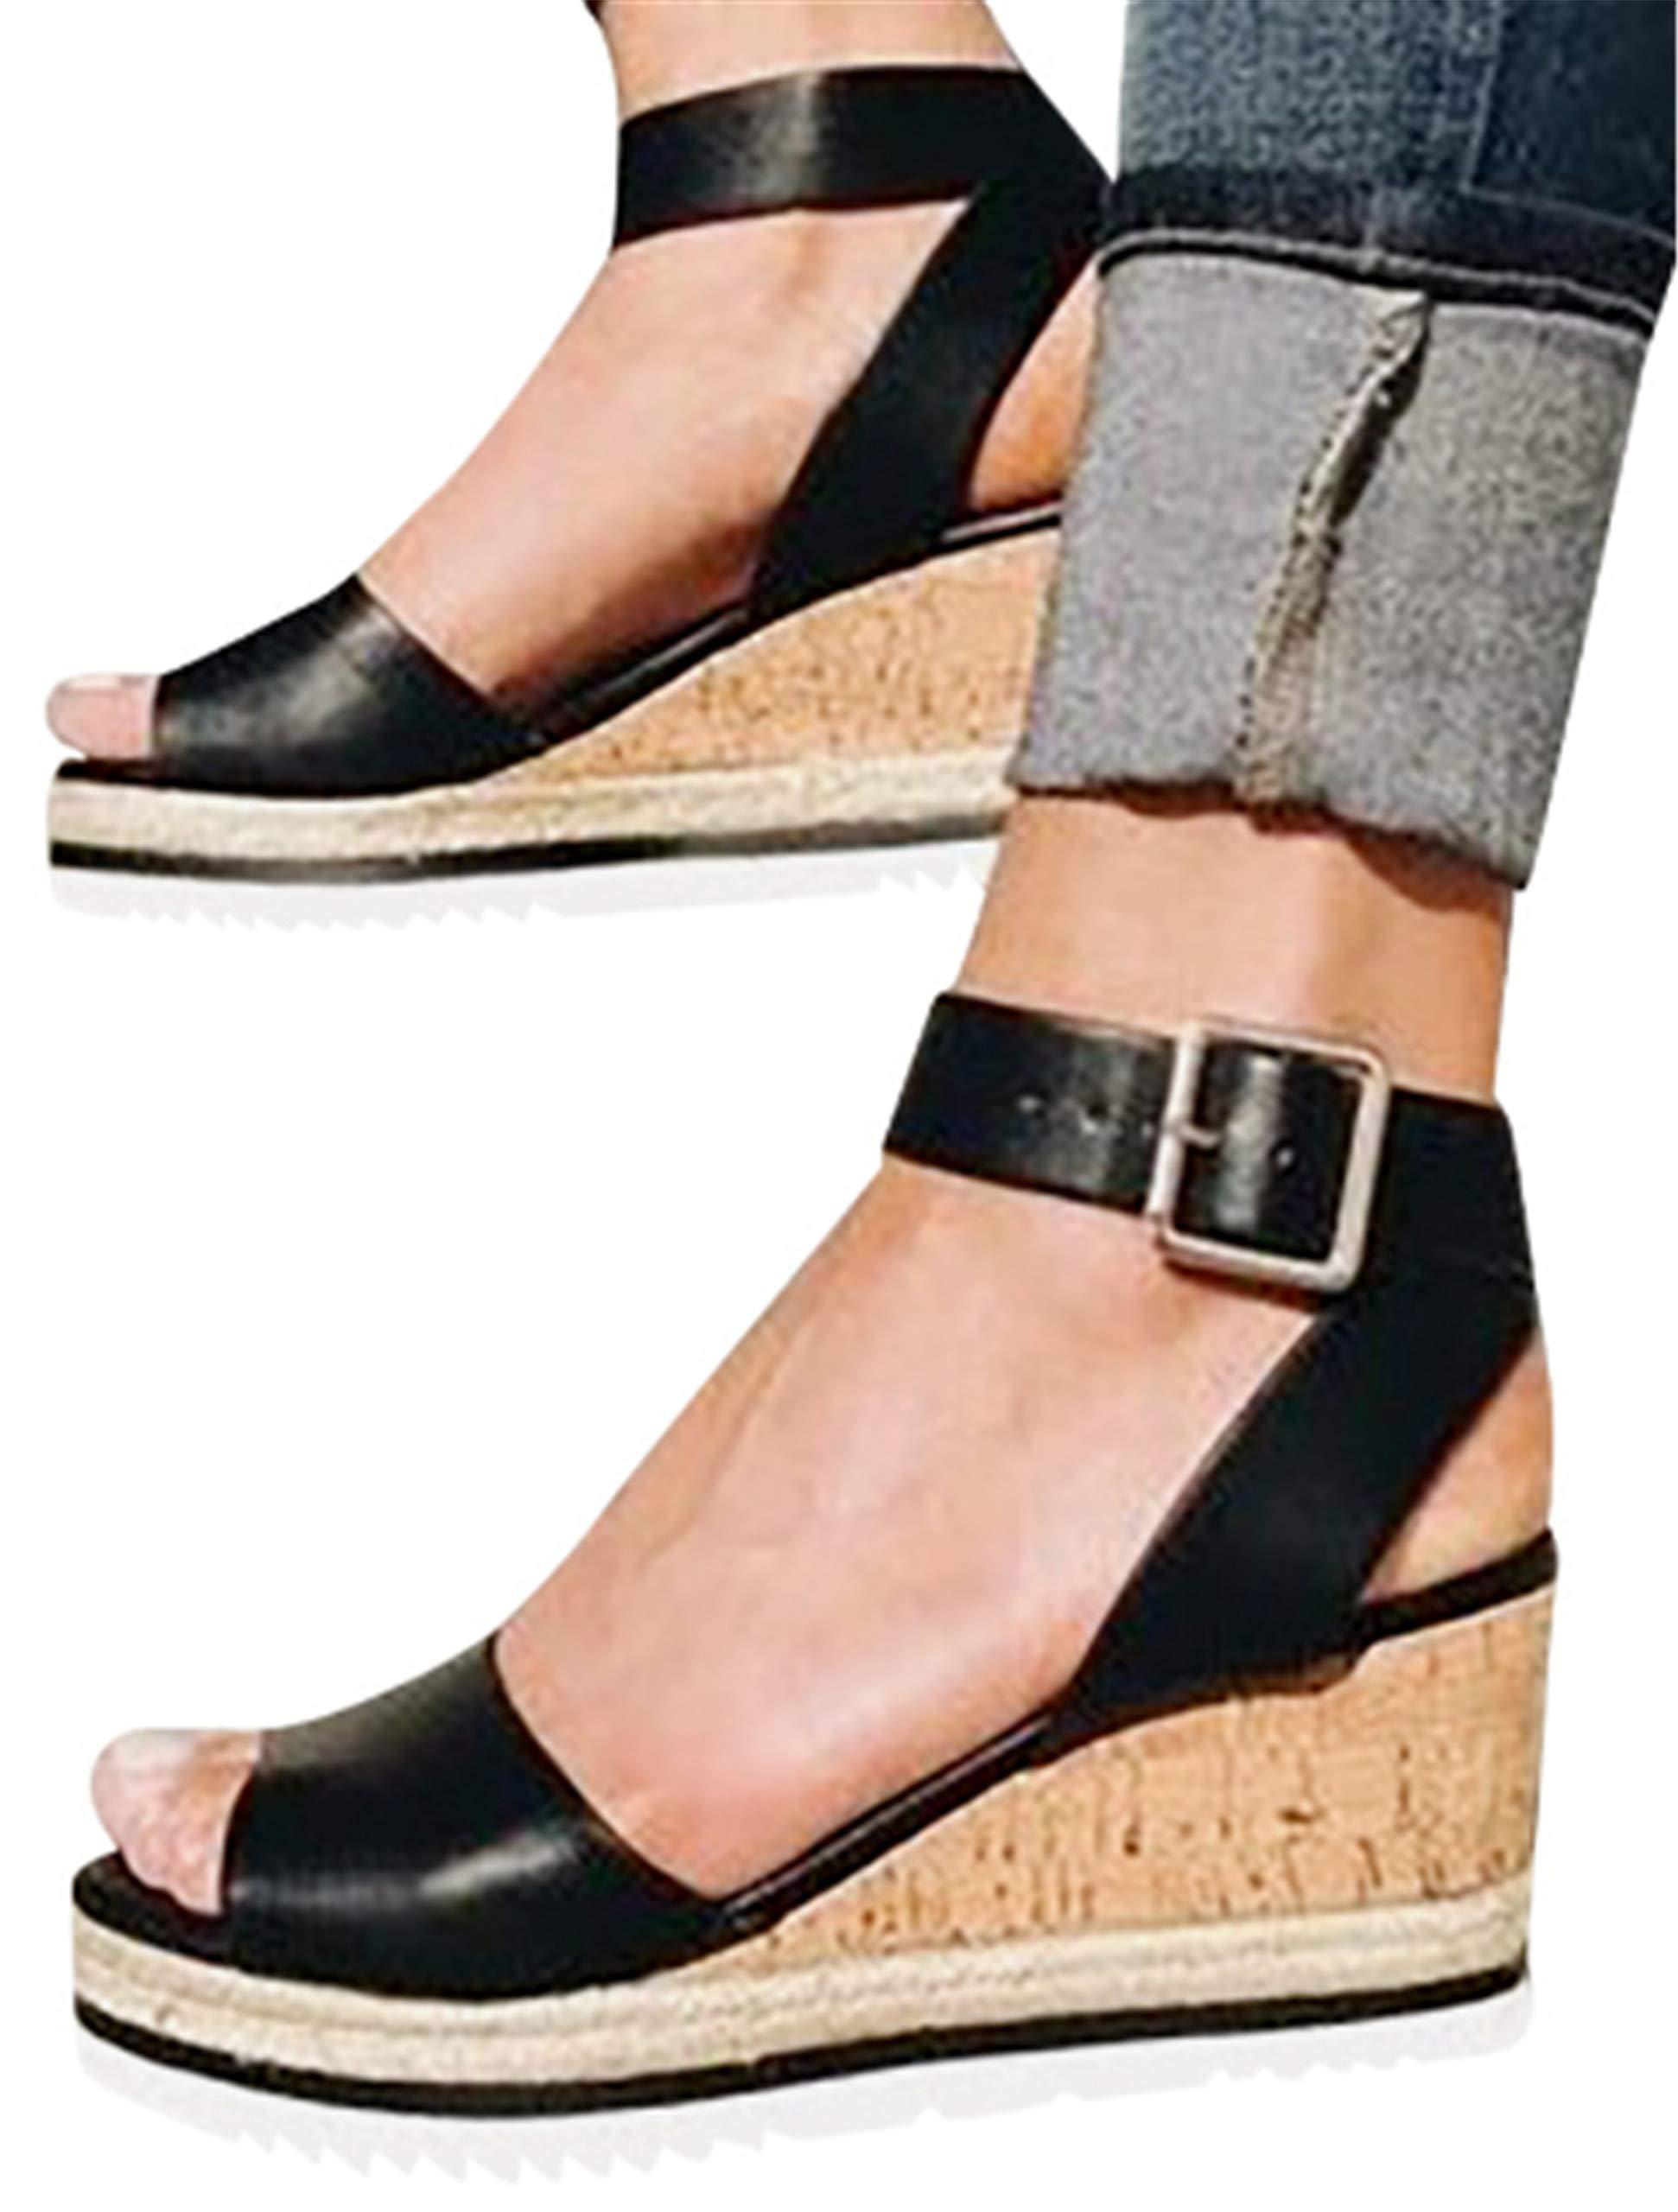 Gyouanime Women Ankle Strap Platform Wedges Sandals High Heel Wedge Sandals Dress Shoes Peep Toe Sandals Black